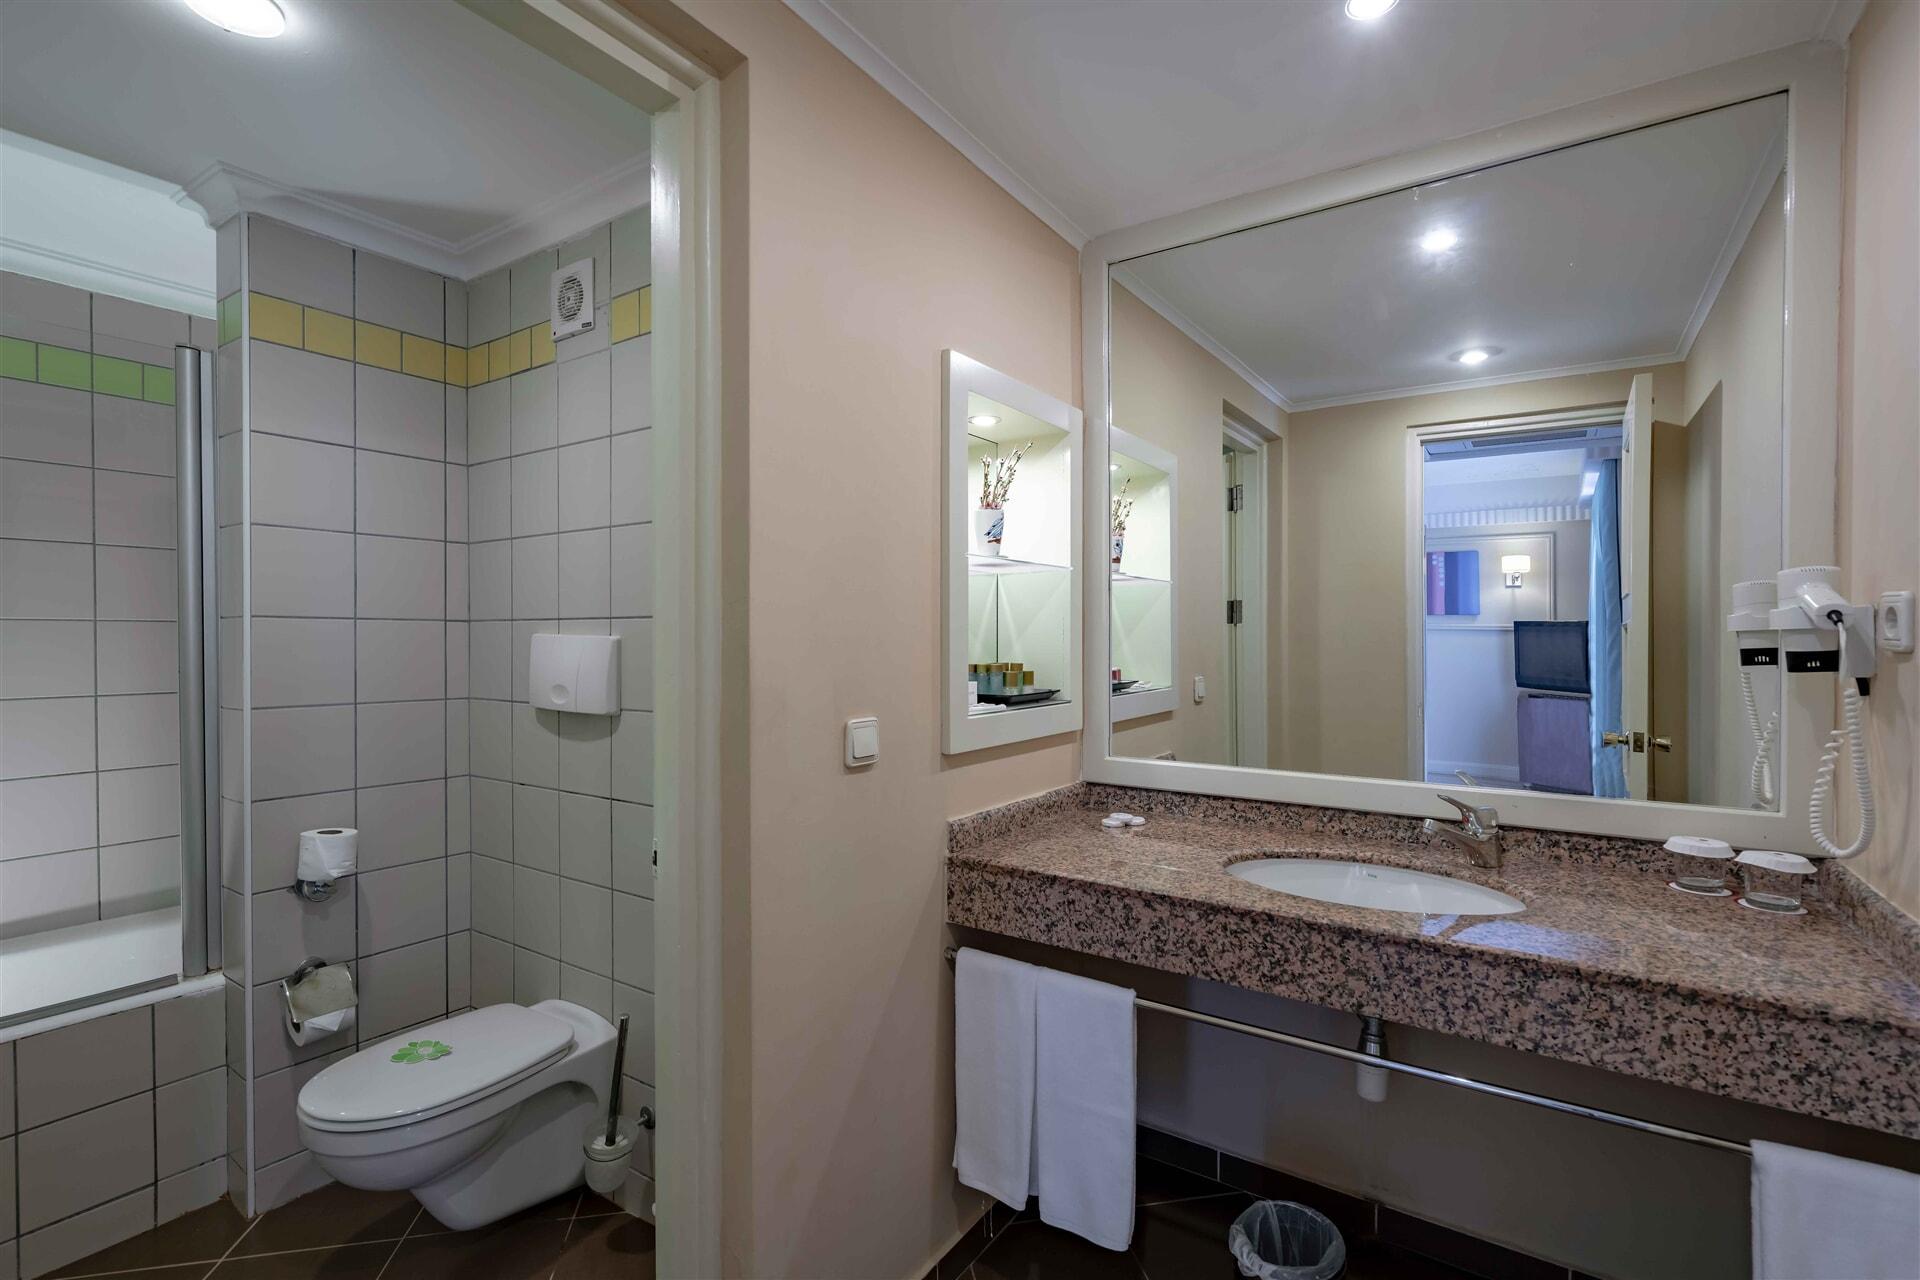 EUPHORIA TEKİROVA HOTEL – Family Club Suite